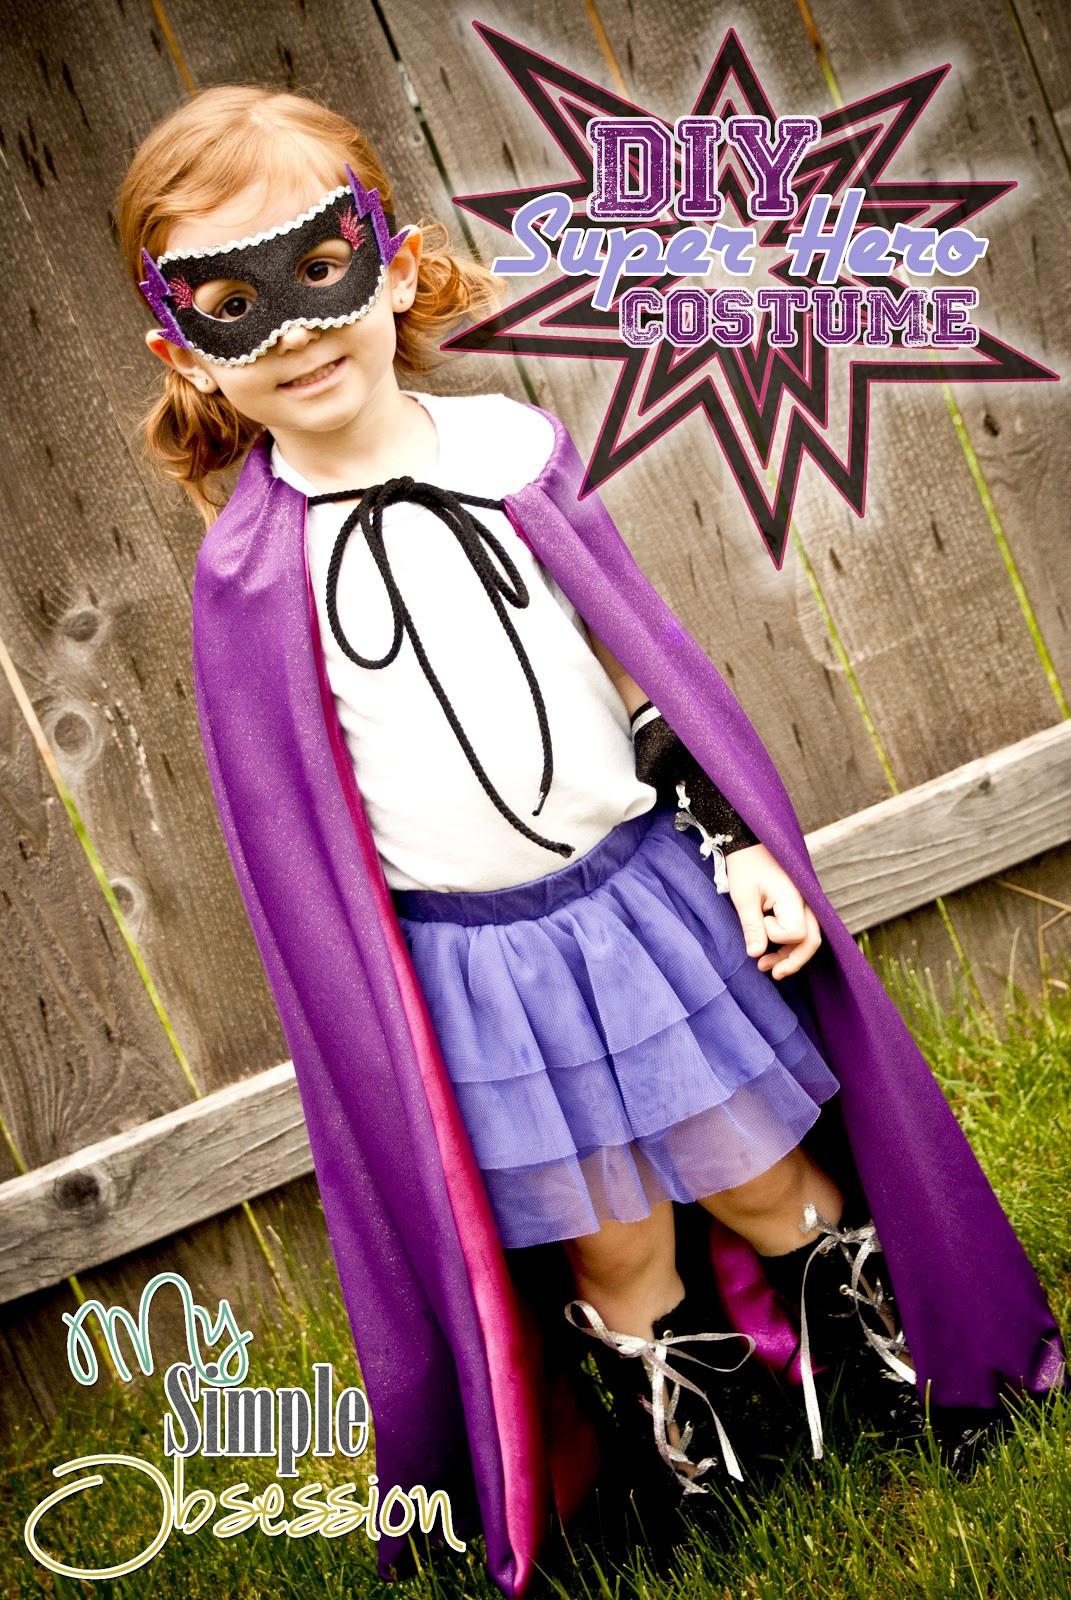 Superhero Costume DIY  My Simple Obsession DIY Super Hero Costume